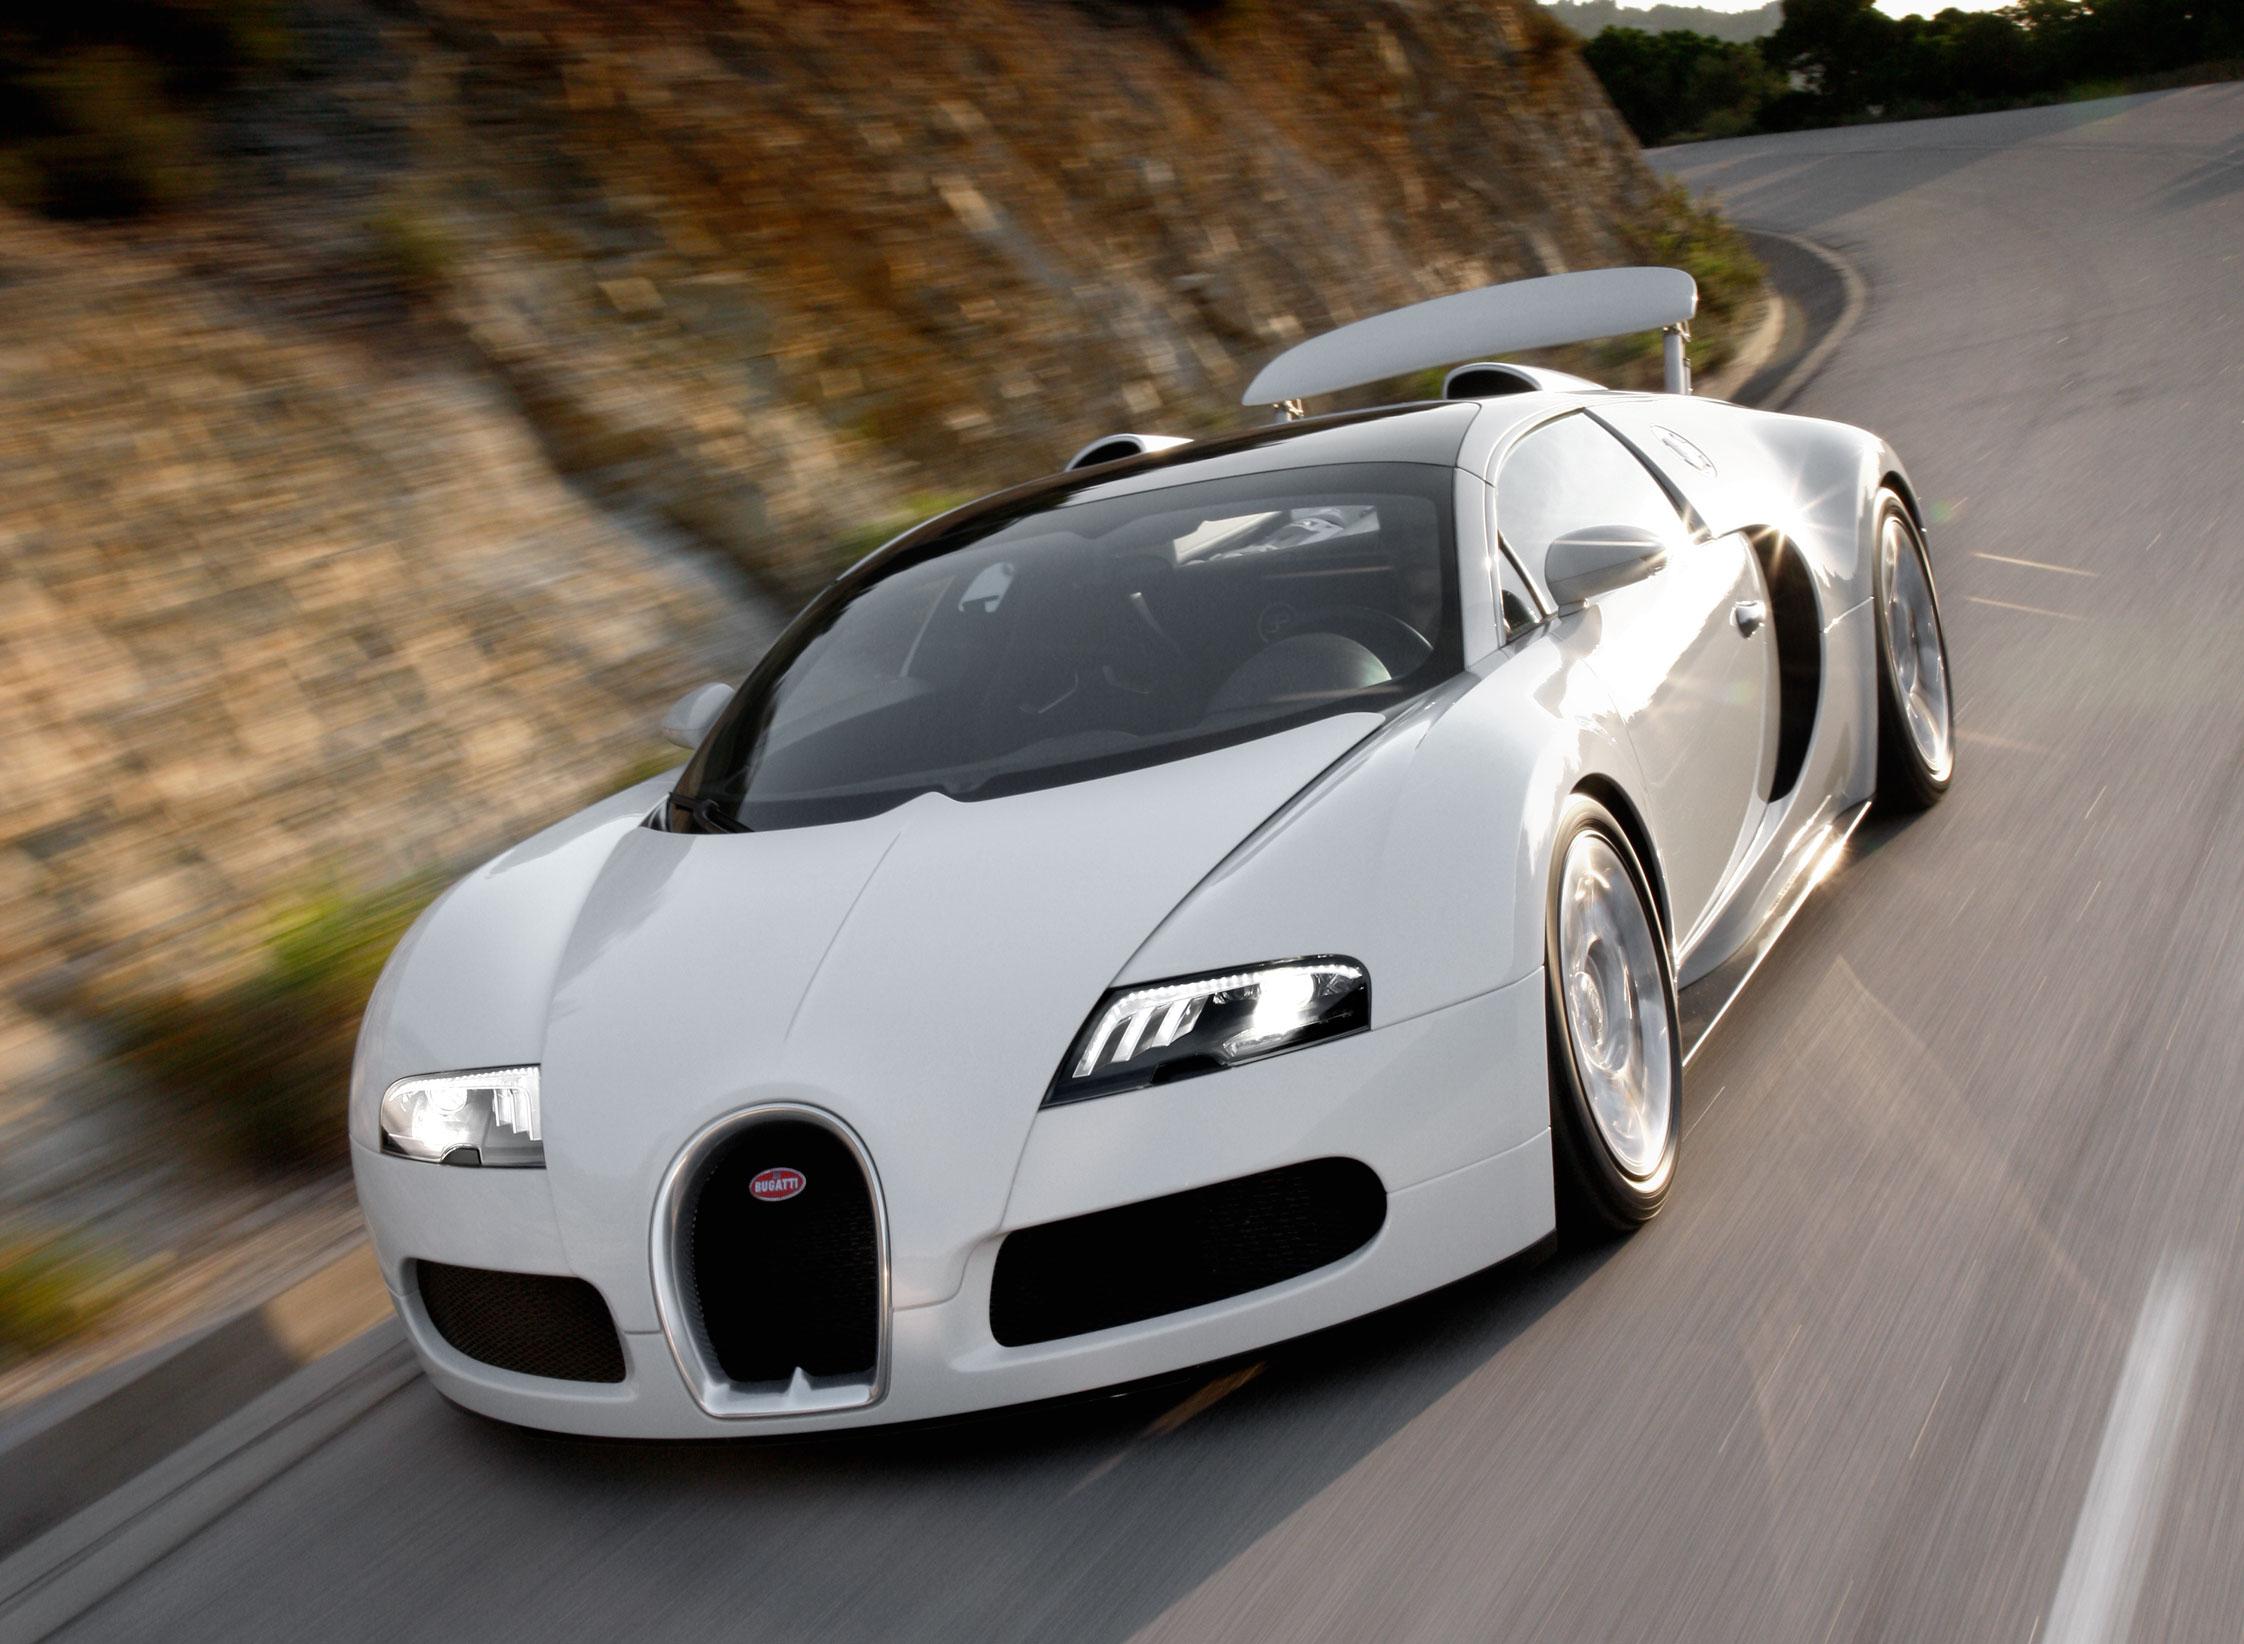 photo bugatti veyron 16 4 grand sport cabriolet 2009. Black Bedroom Furniture Sets. Home Design Ideas